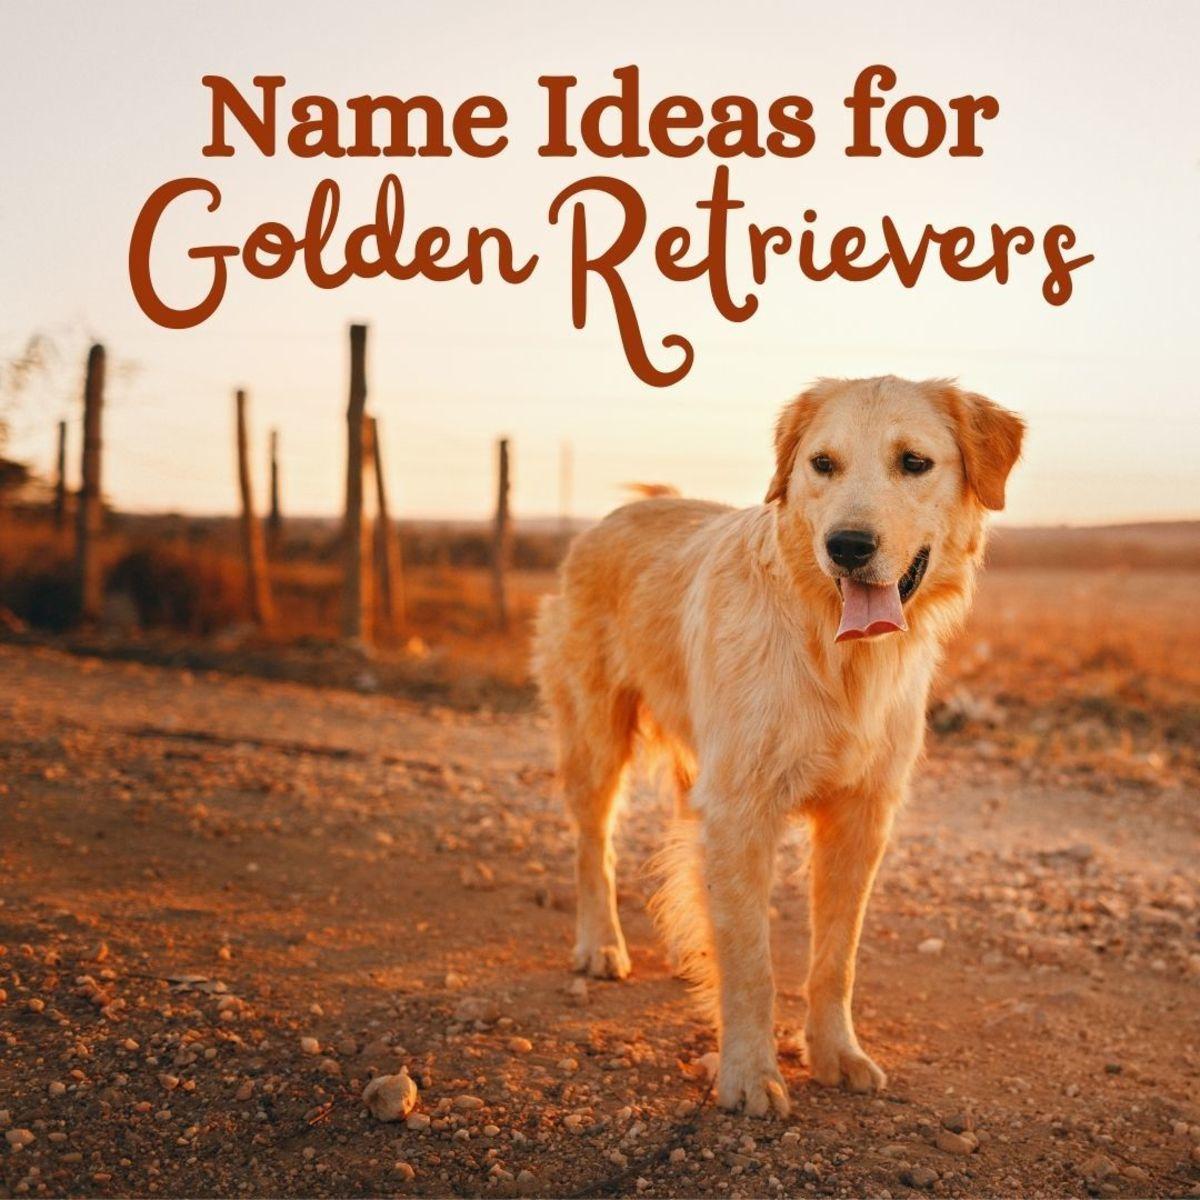 60+ Golden Retriever names